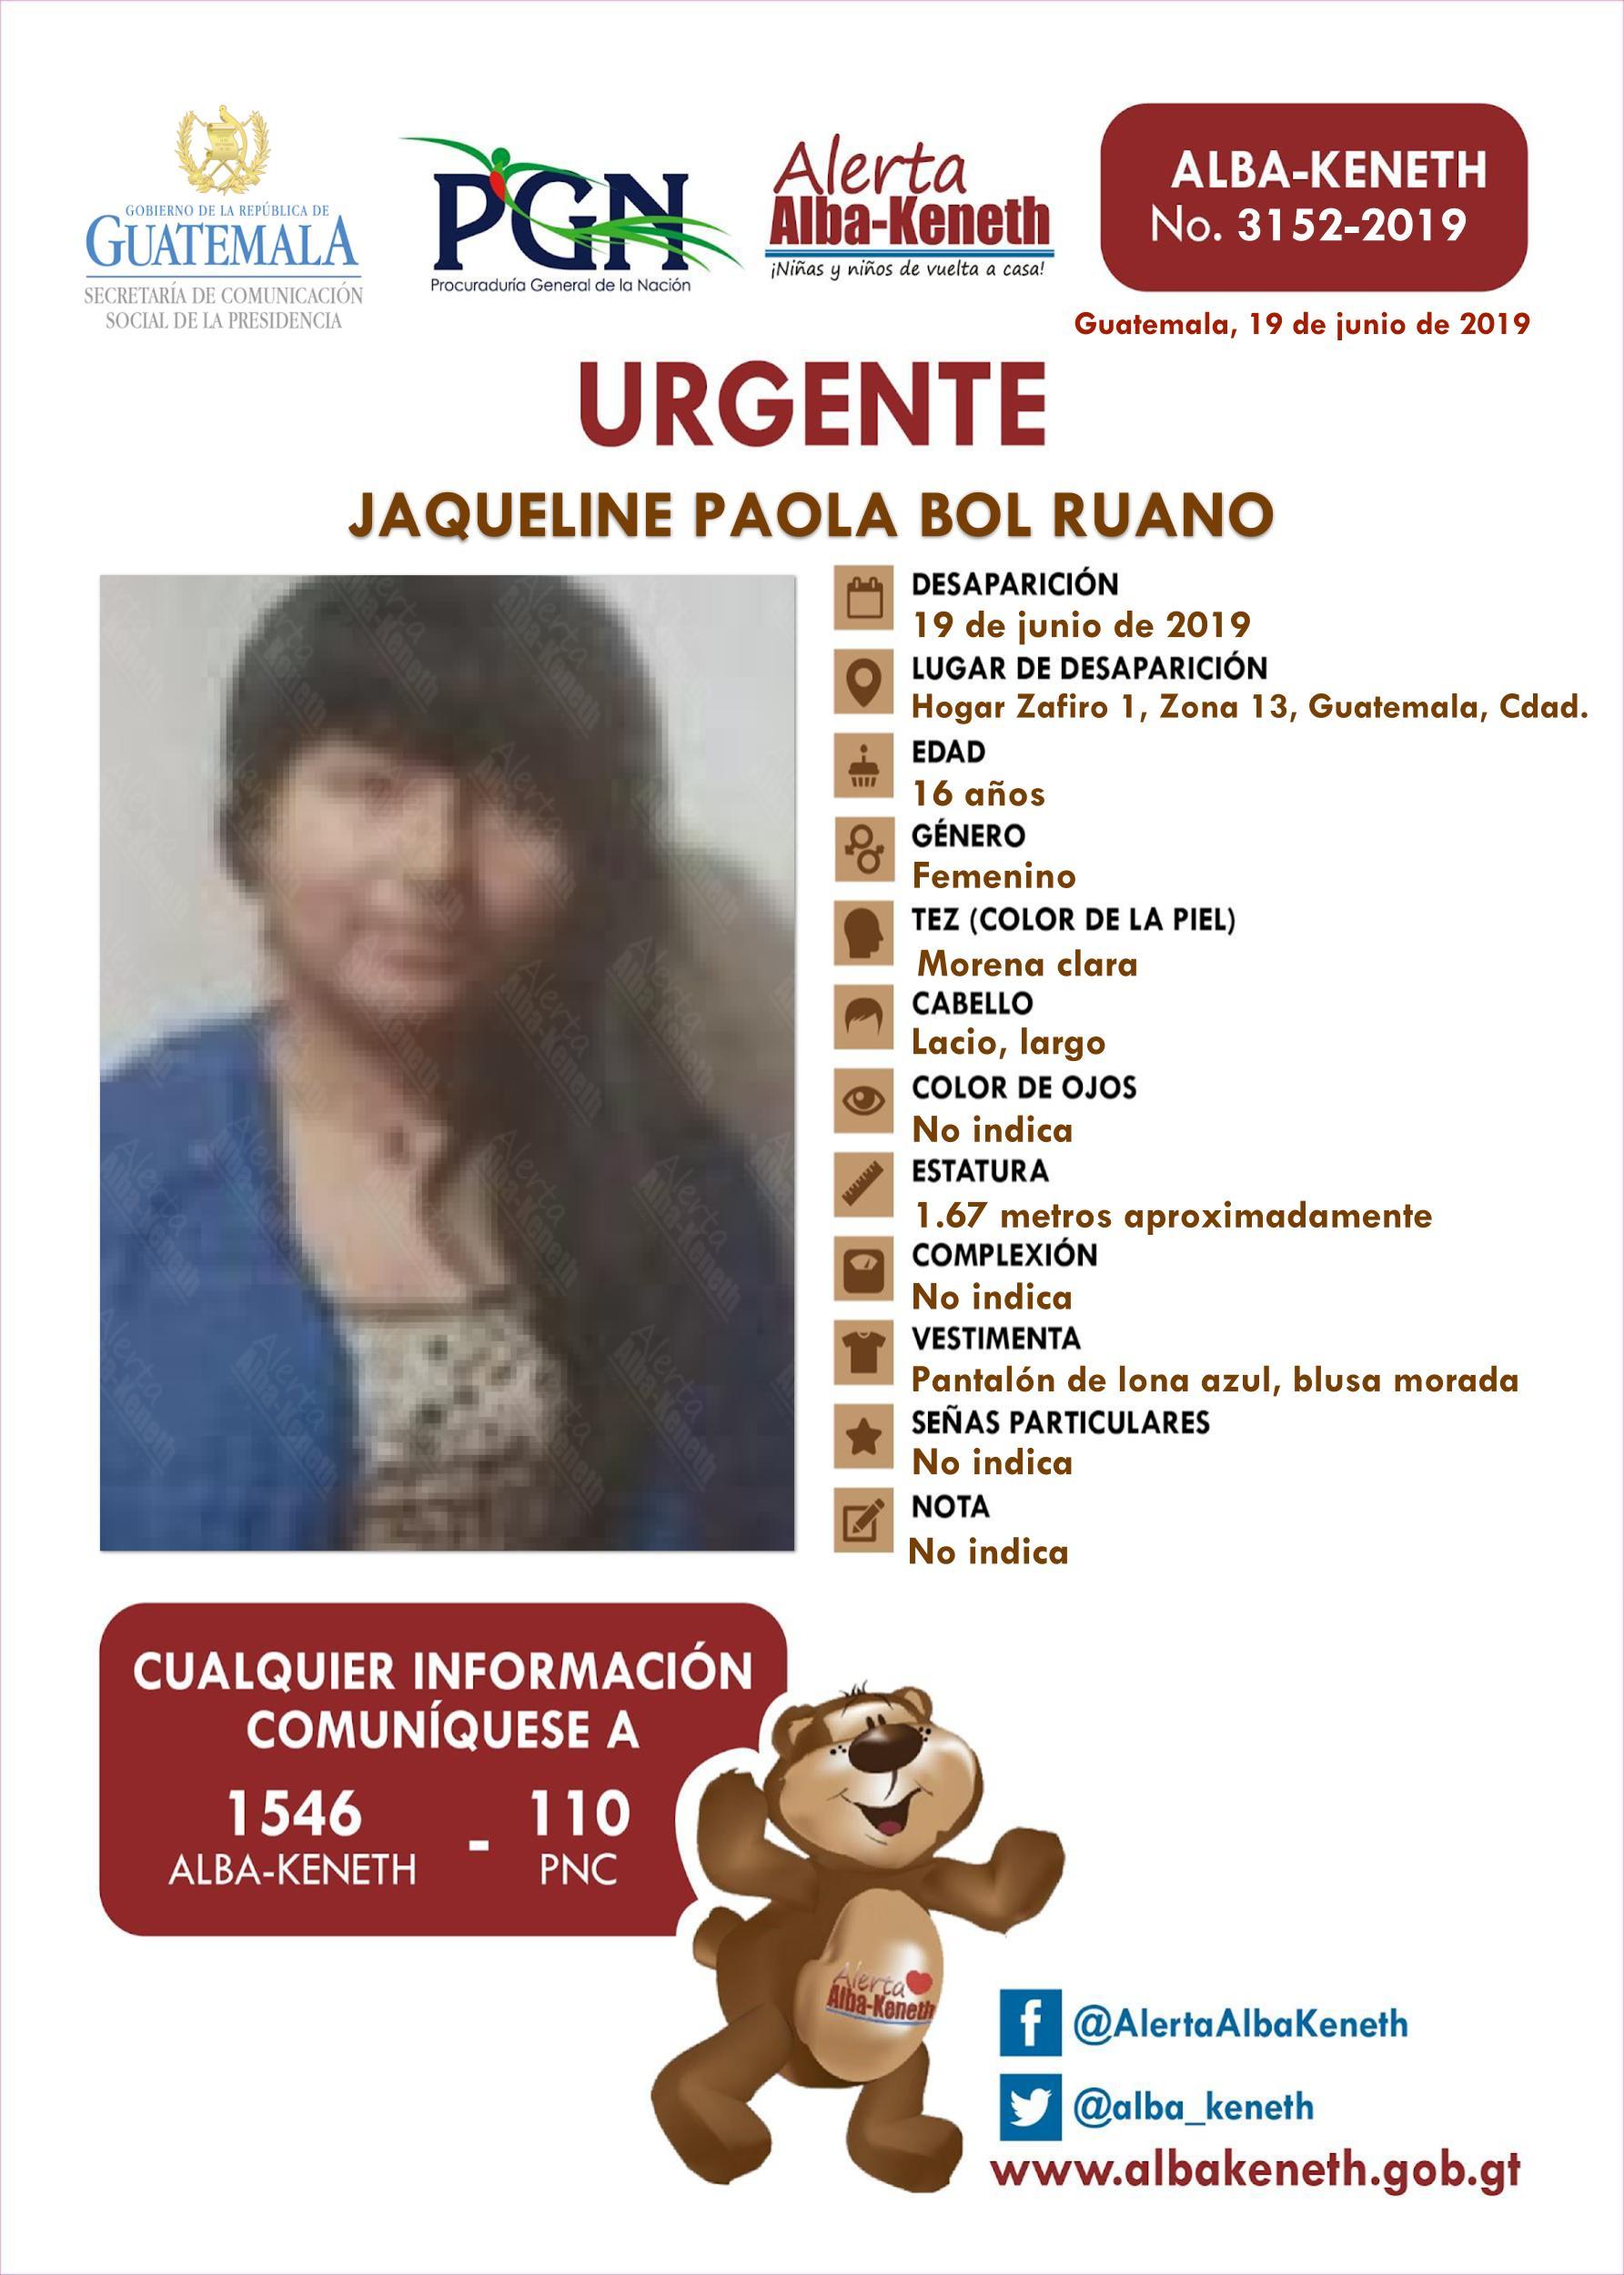 Jaqueline Paola Bol Ruano